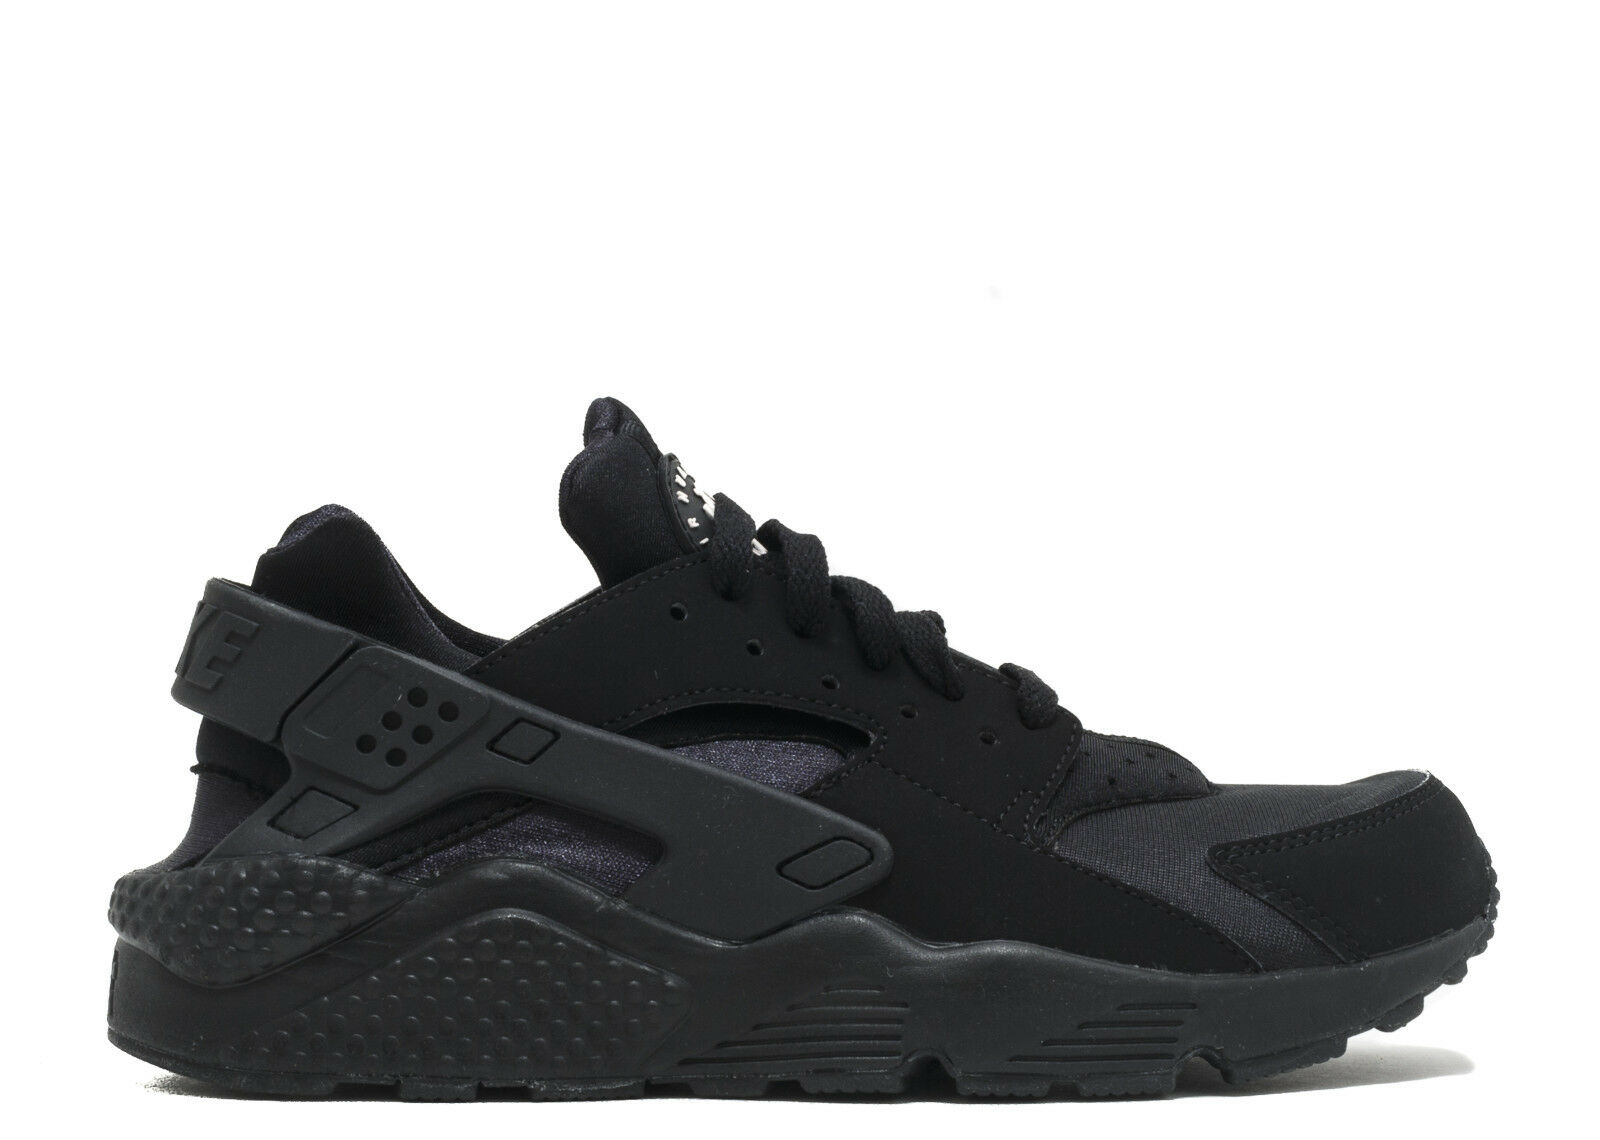 70134ebd6a1 New Nike Air huarache M Black 318429-003 Running Running Running Shoes Men  349f07